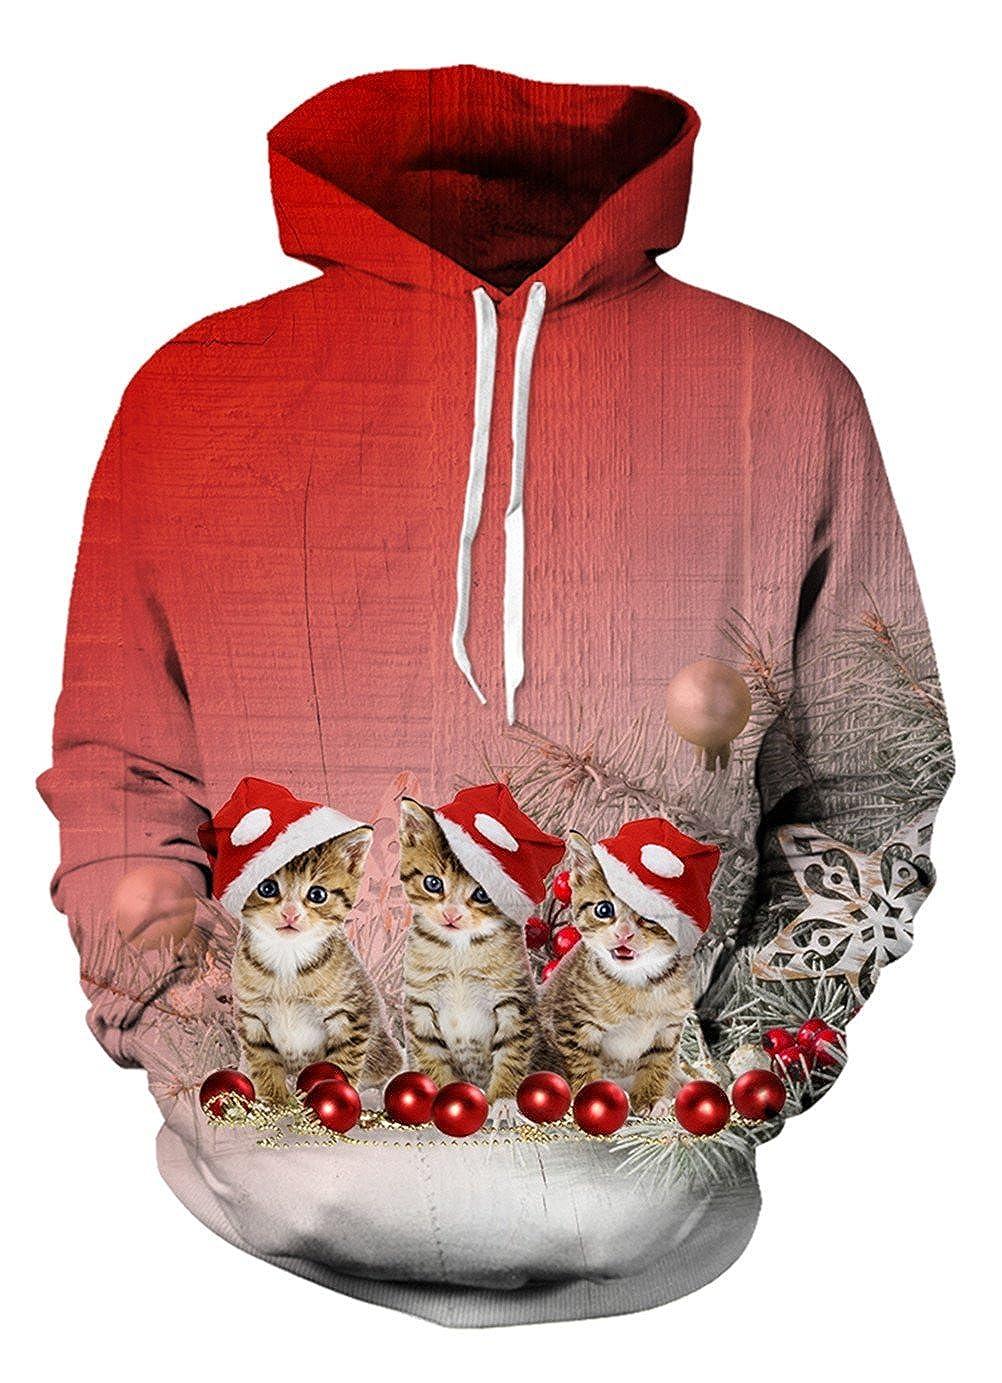 uideazone Unisex Hooded Sweatshirt 3D Printed Fleece Pullover Hoodie with Big Pockets